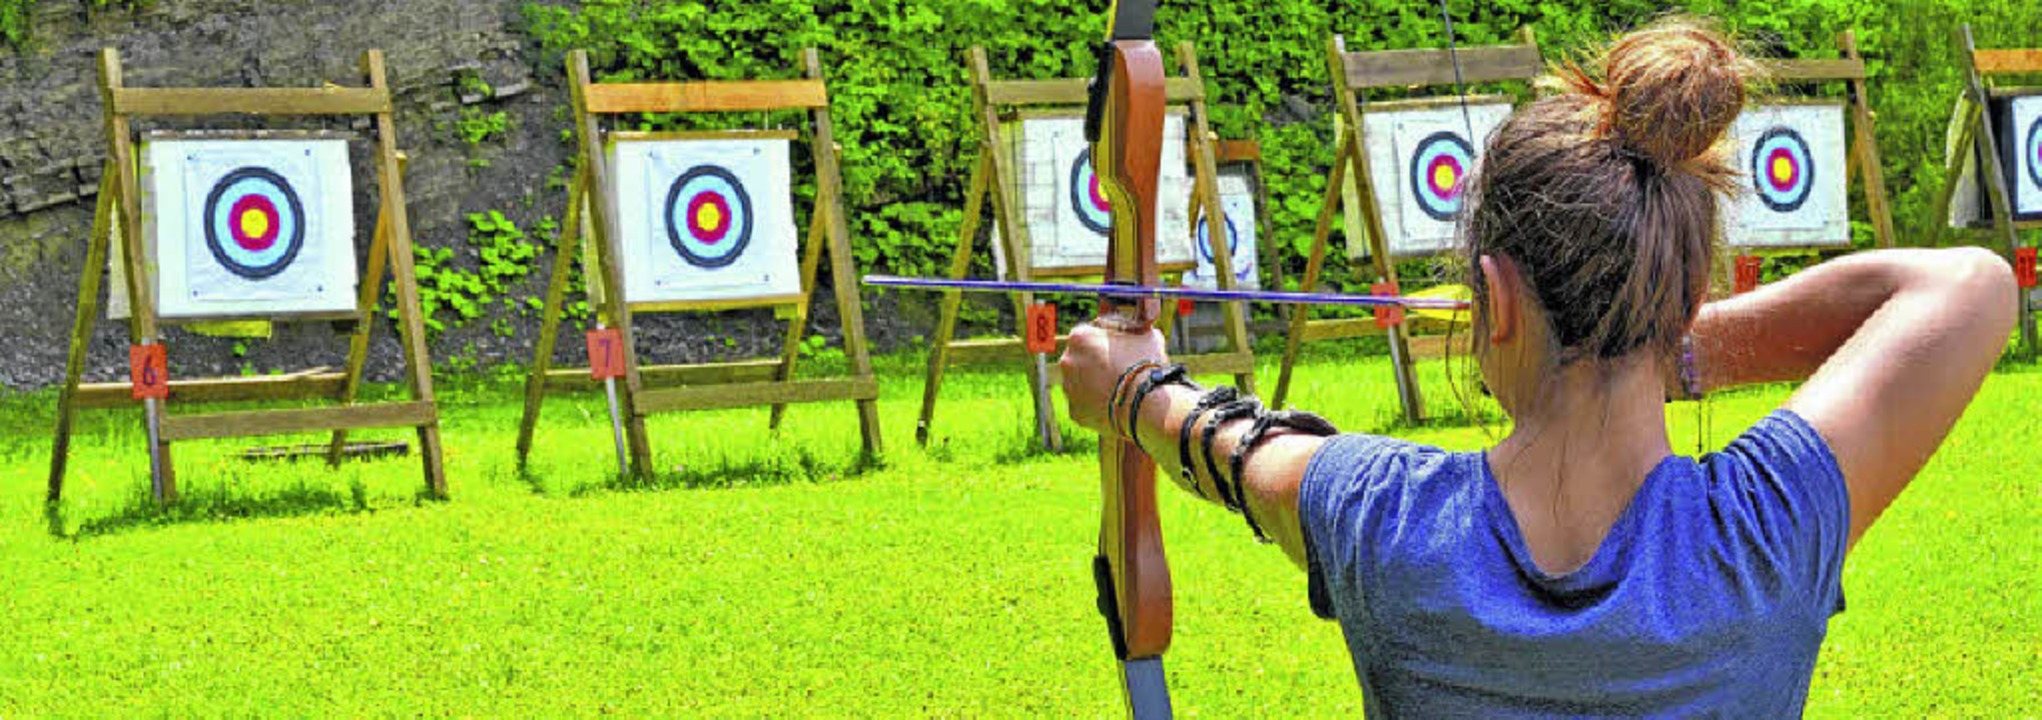 Bogensport soll den Verein attraktiver machen.   | Foto: Andreas P (fotolia)